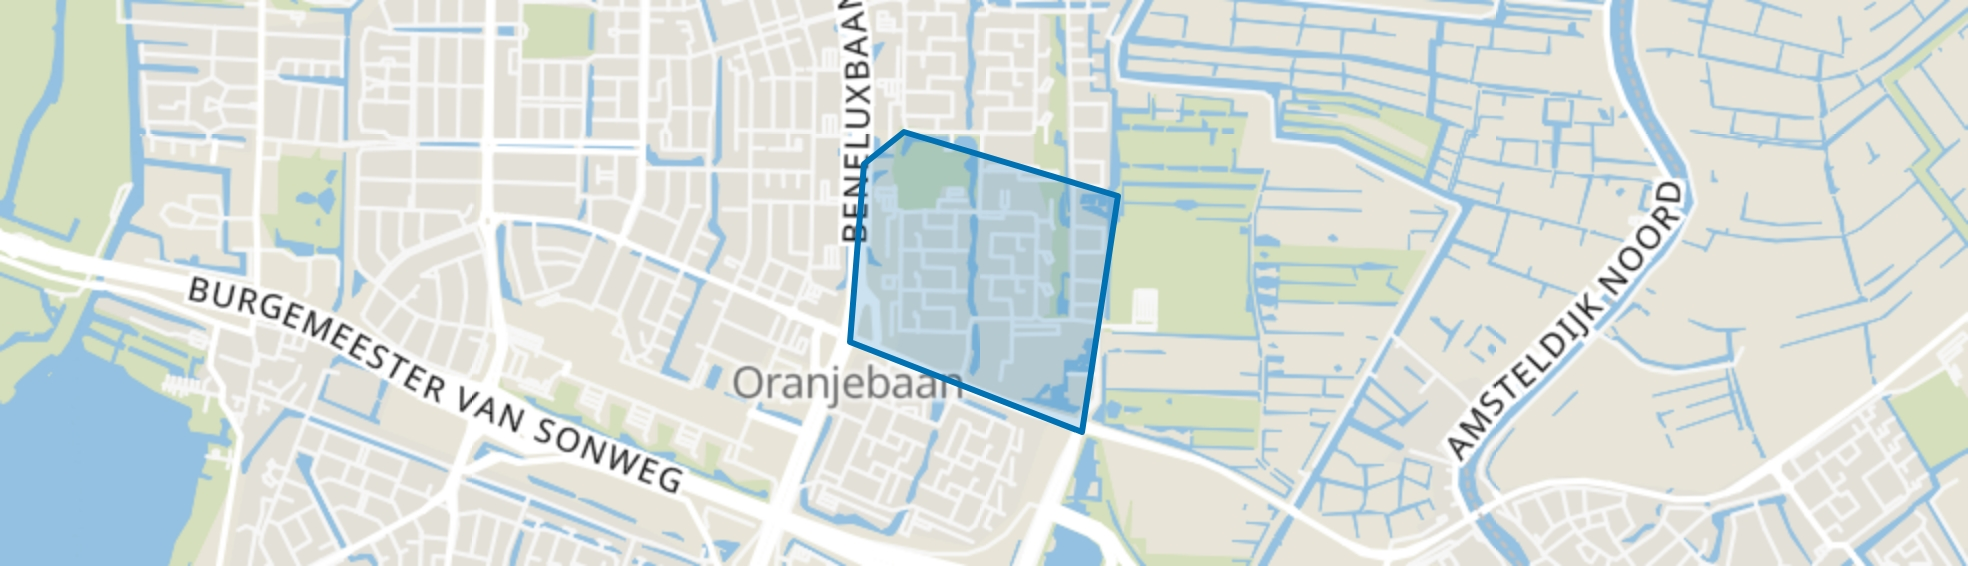 Boekenbuurt, Amstelveen map